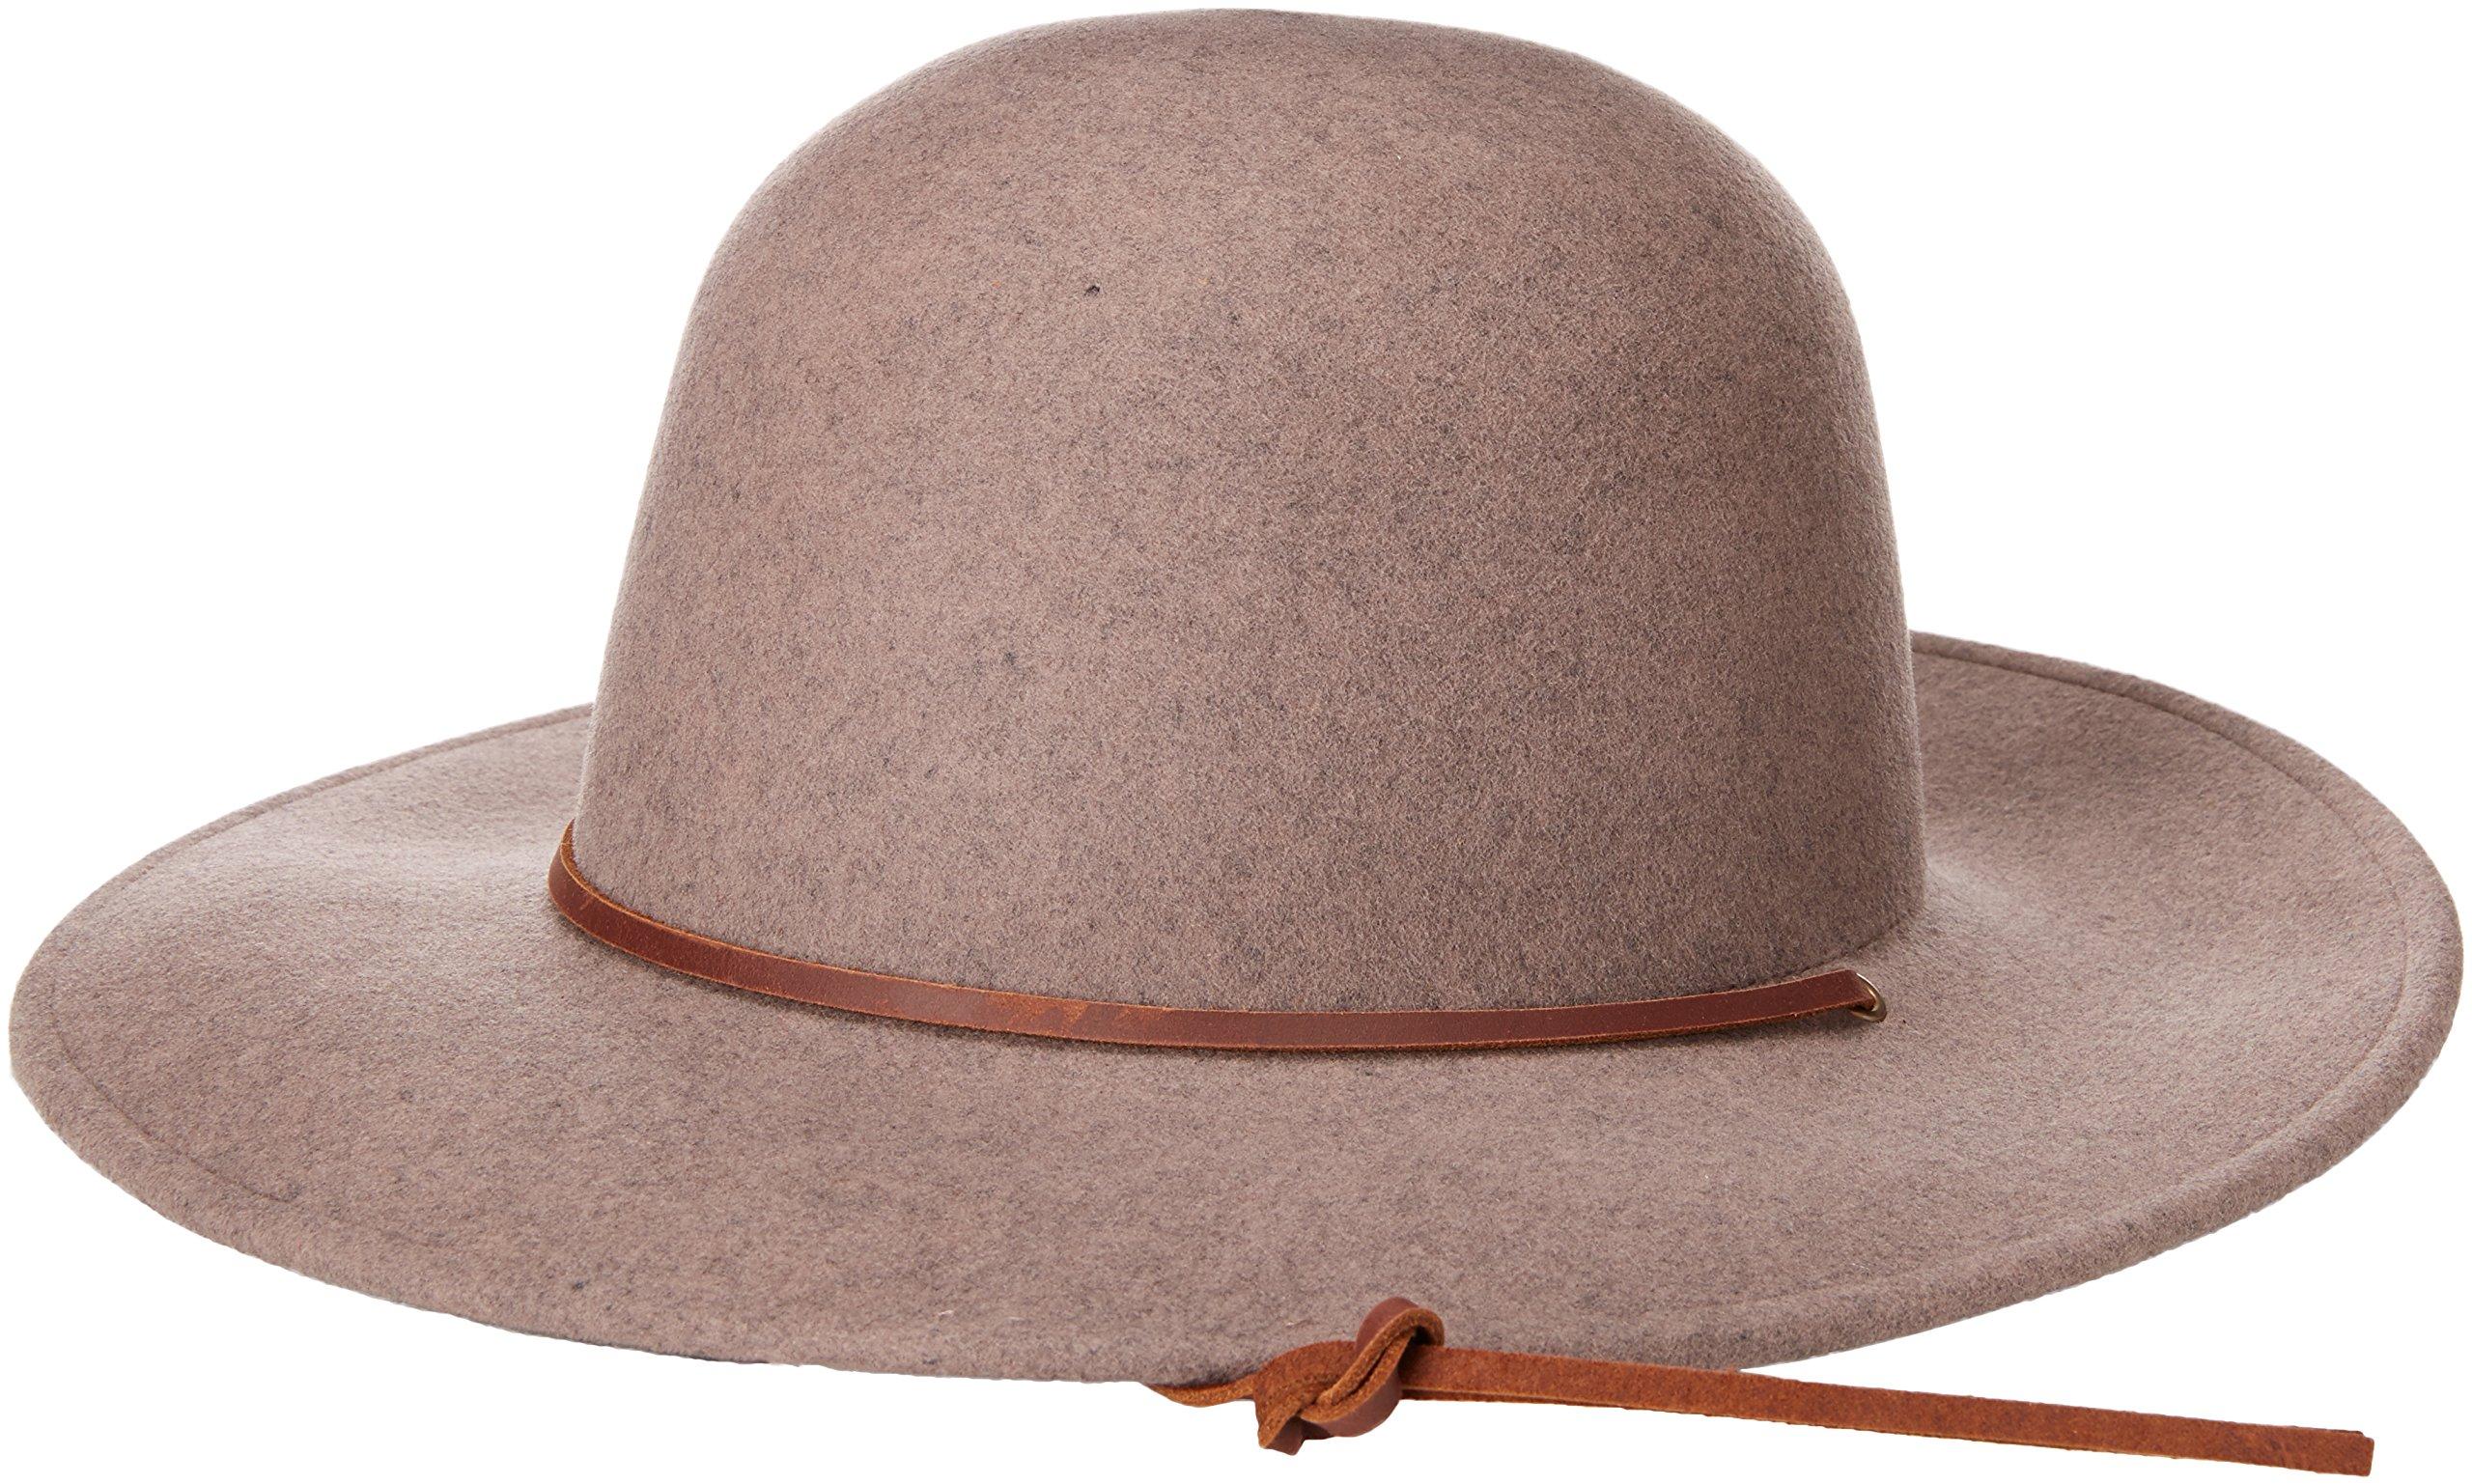 Galleon - Brixton Men s Tiller Wide Brim Felt Fedora Hat bdd08eb3788